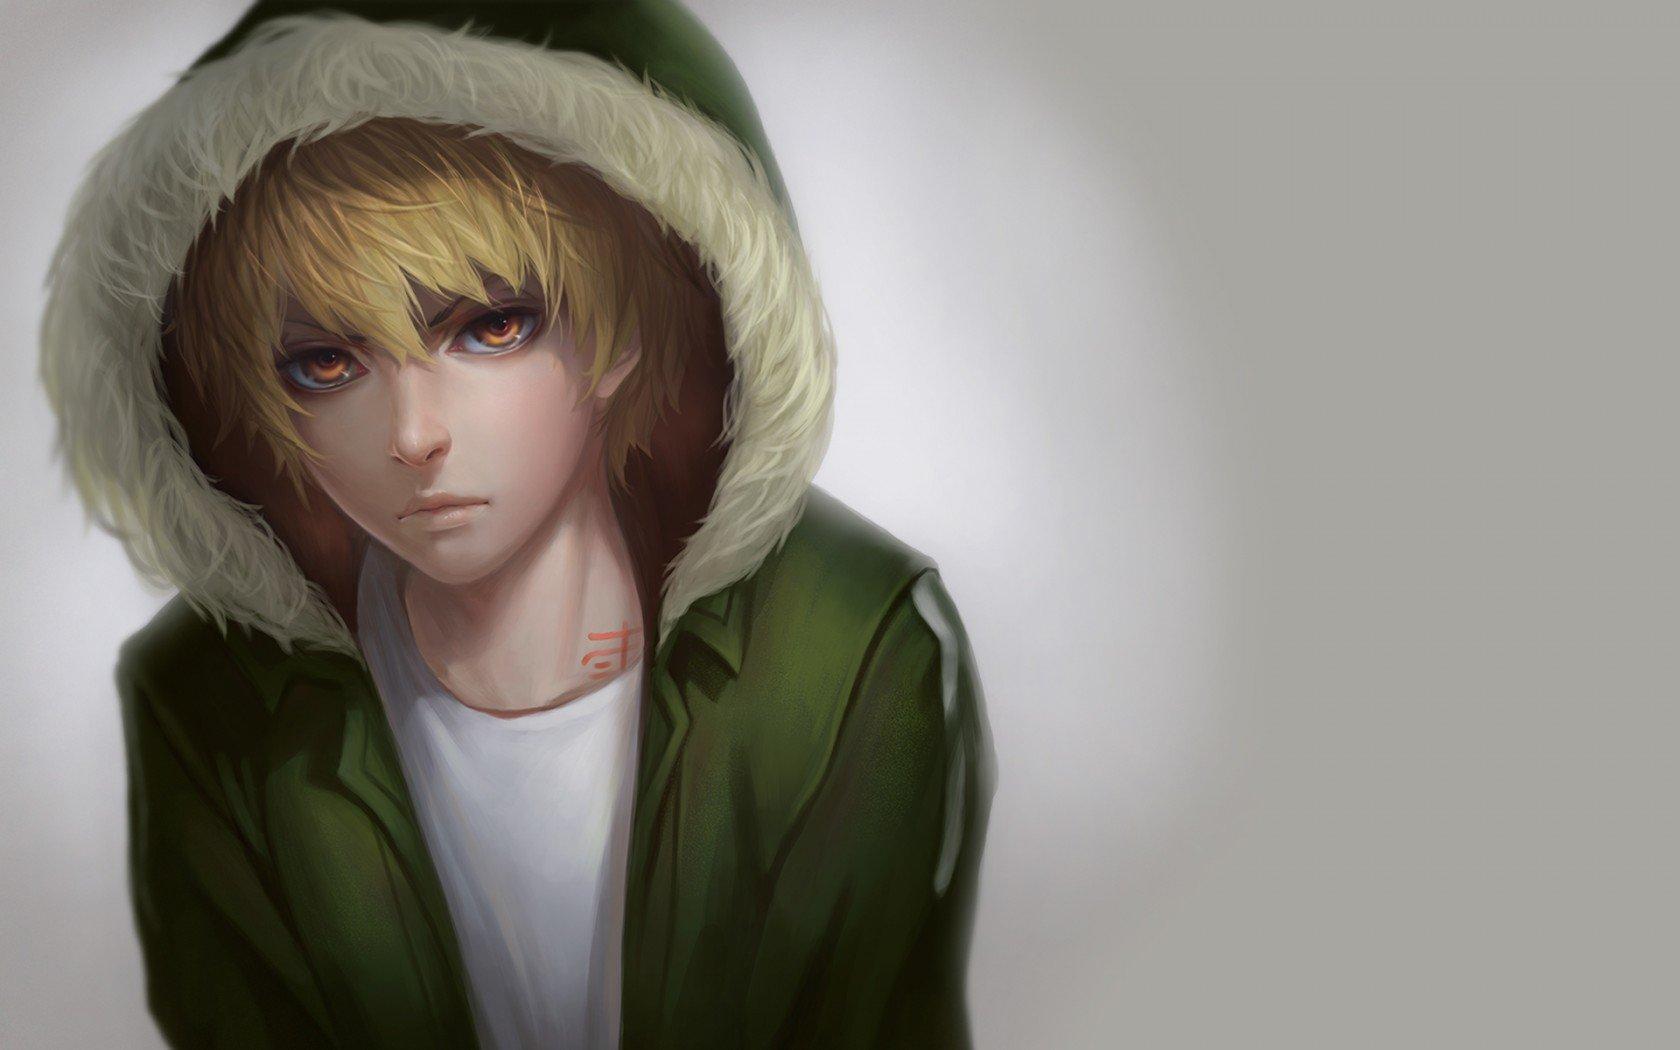 Blond Hair Boy Green Red Eyes Anime Character Wallpaper